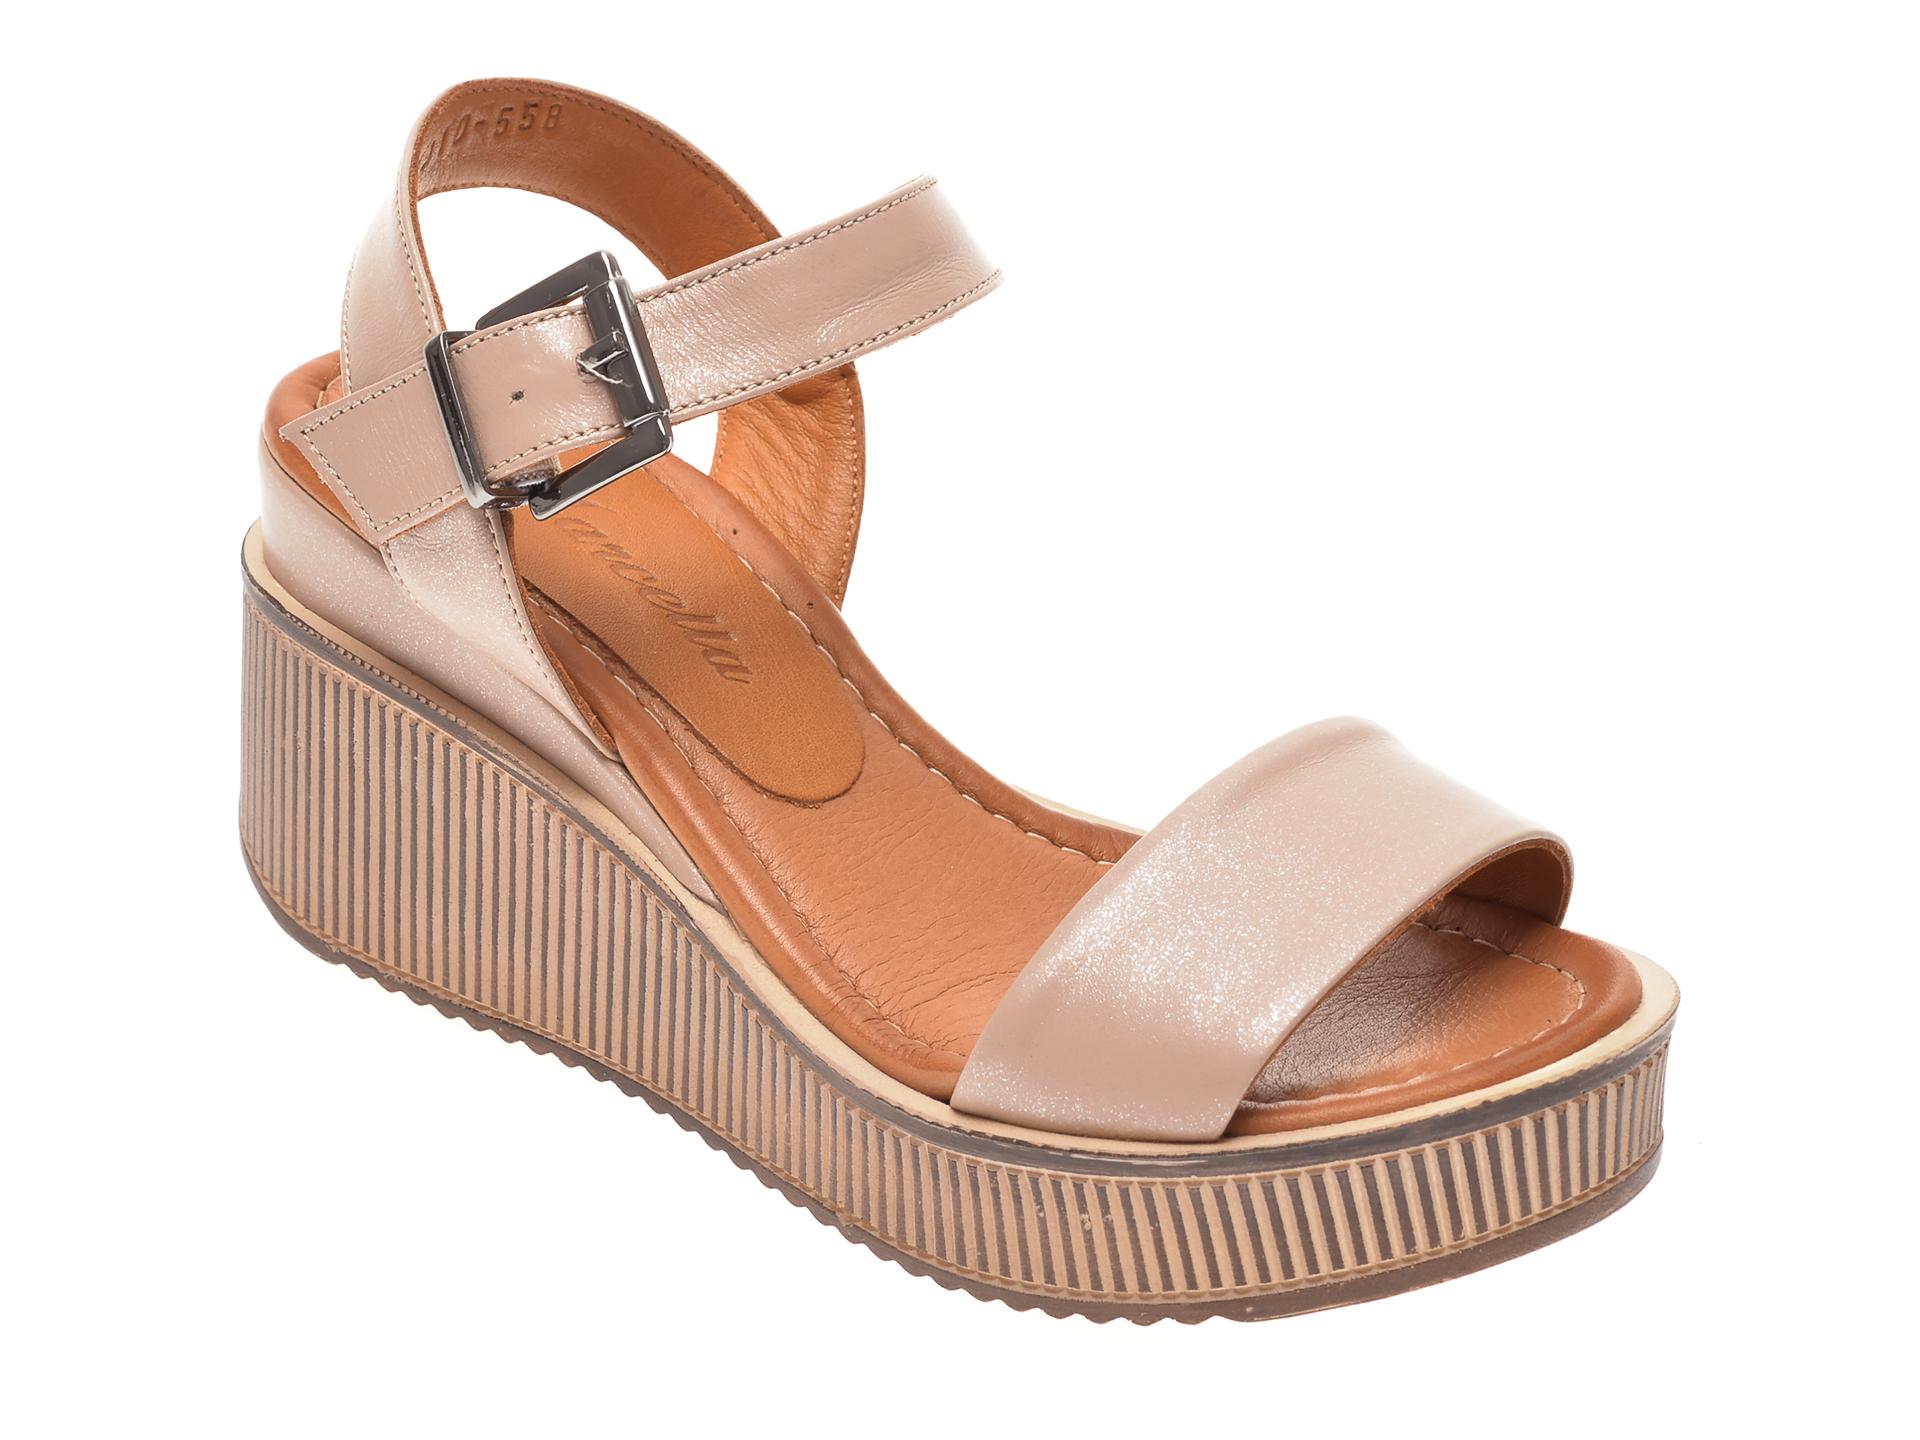 Sandale MISS LIZA maro, 1181910, din piele naturala